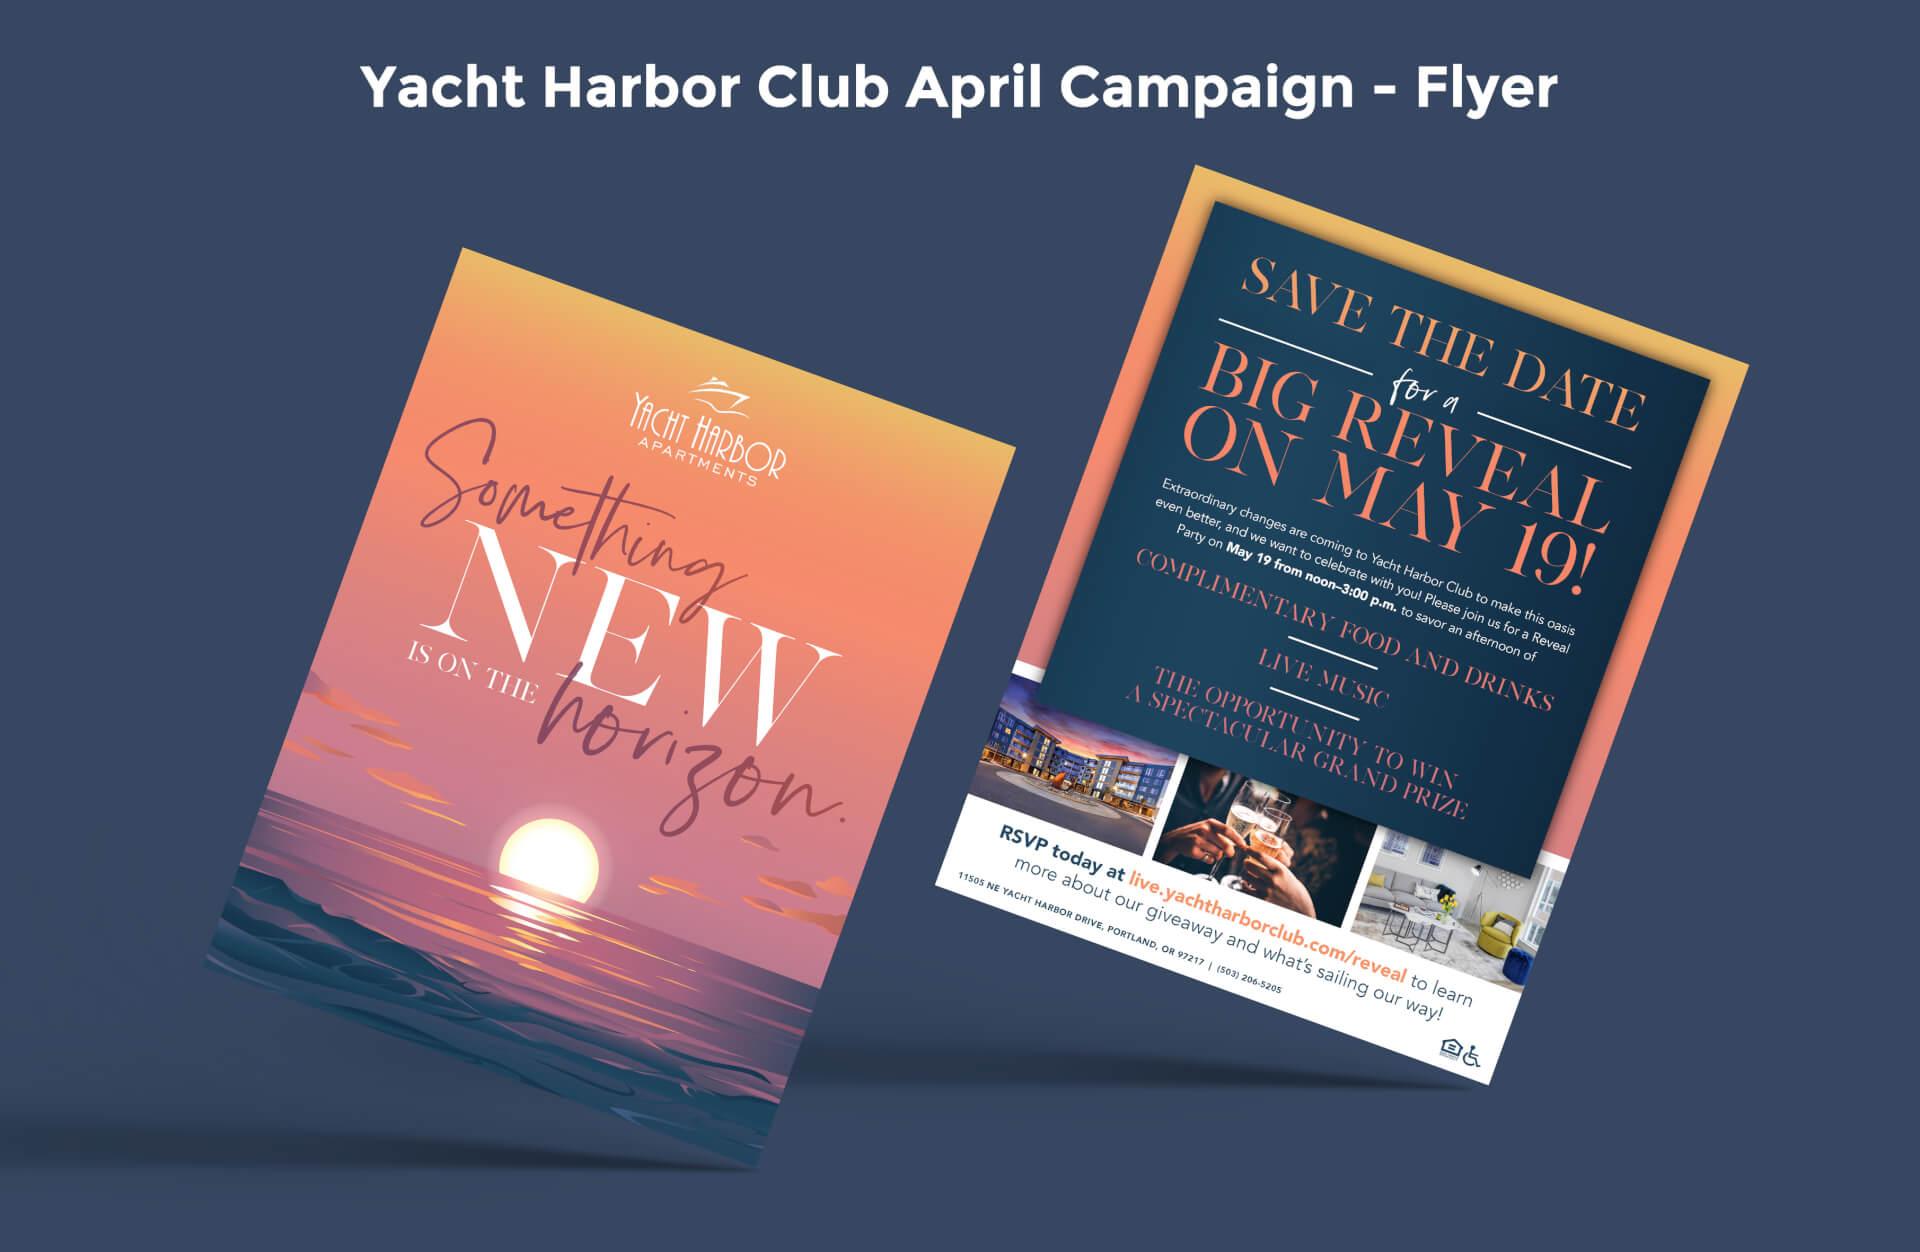 Yacht Harbor Club April Campaign Flyer